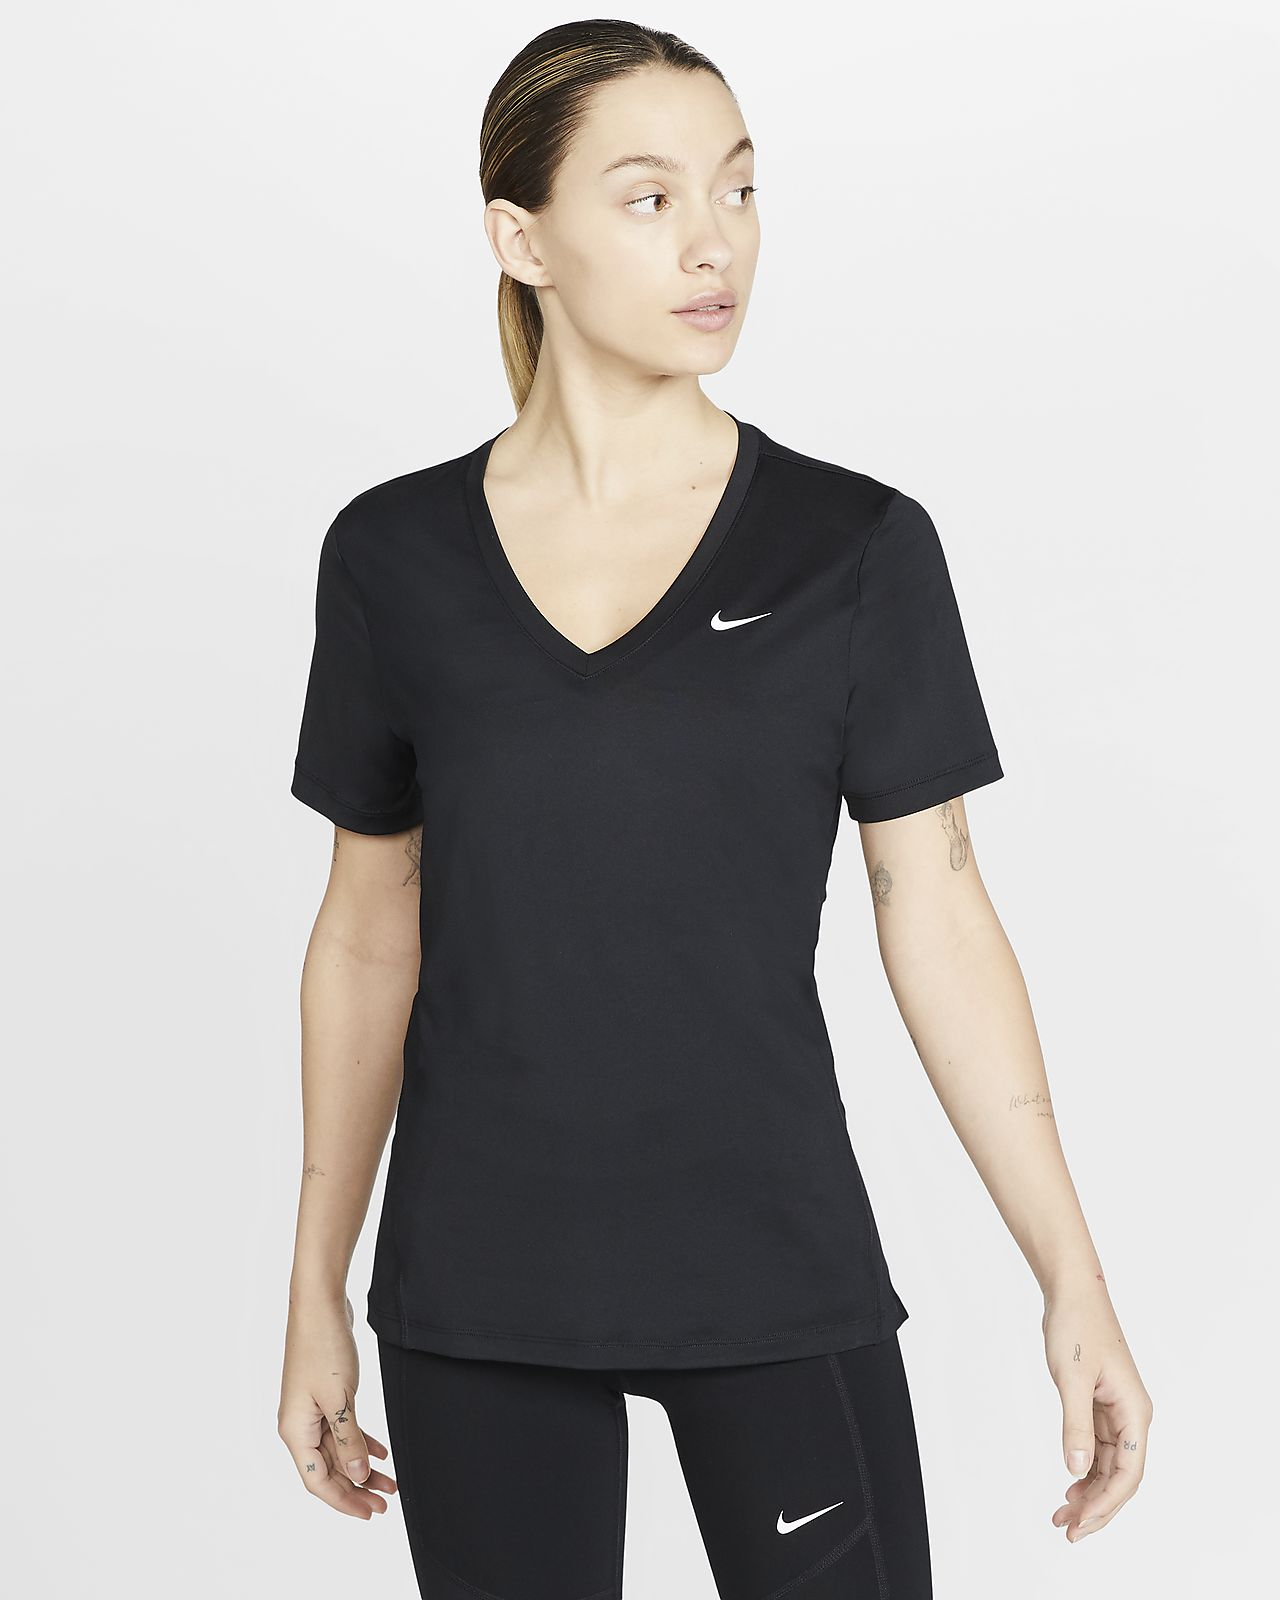 Nike Victory Kurzarm-Trainingsoberteil für Damen